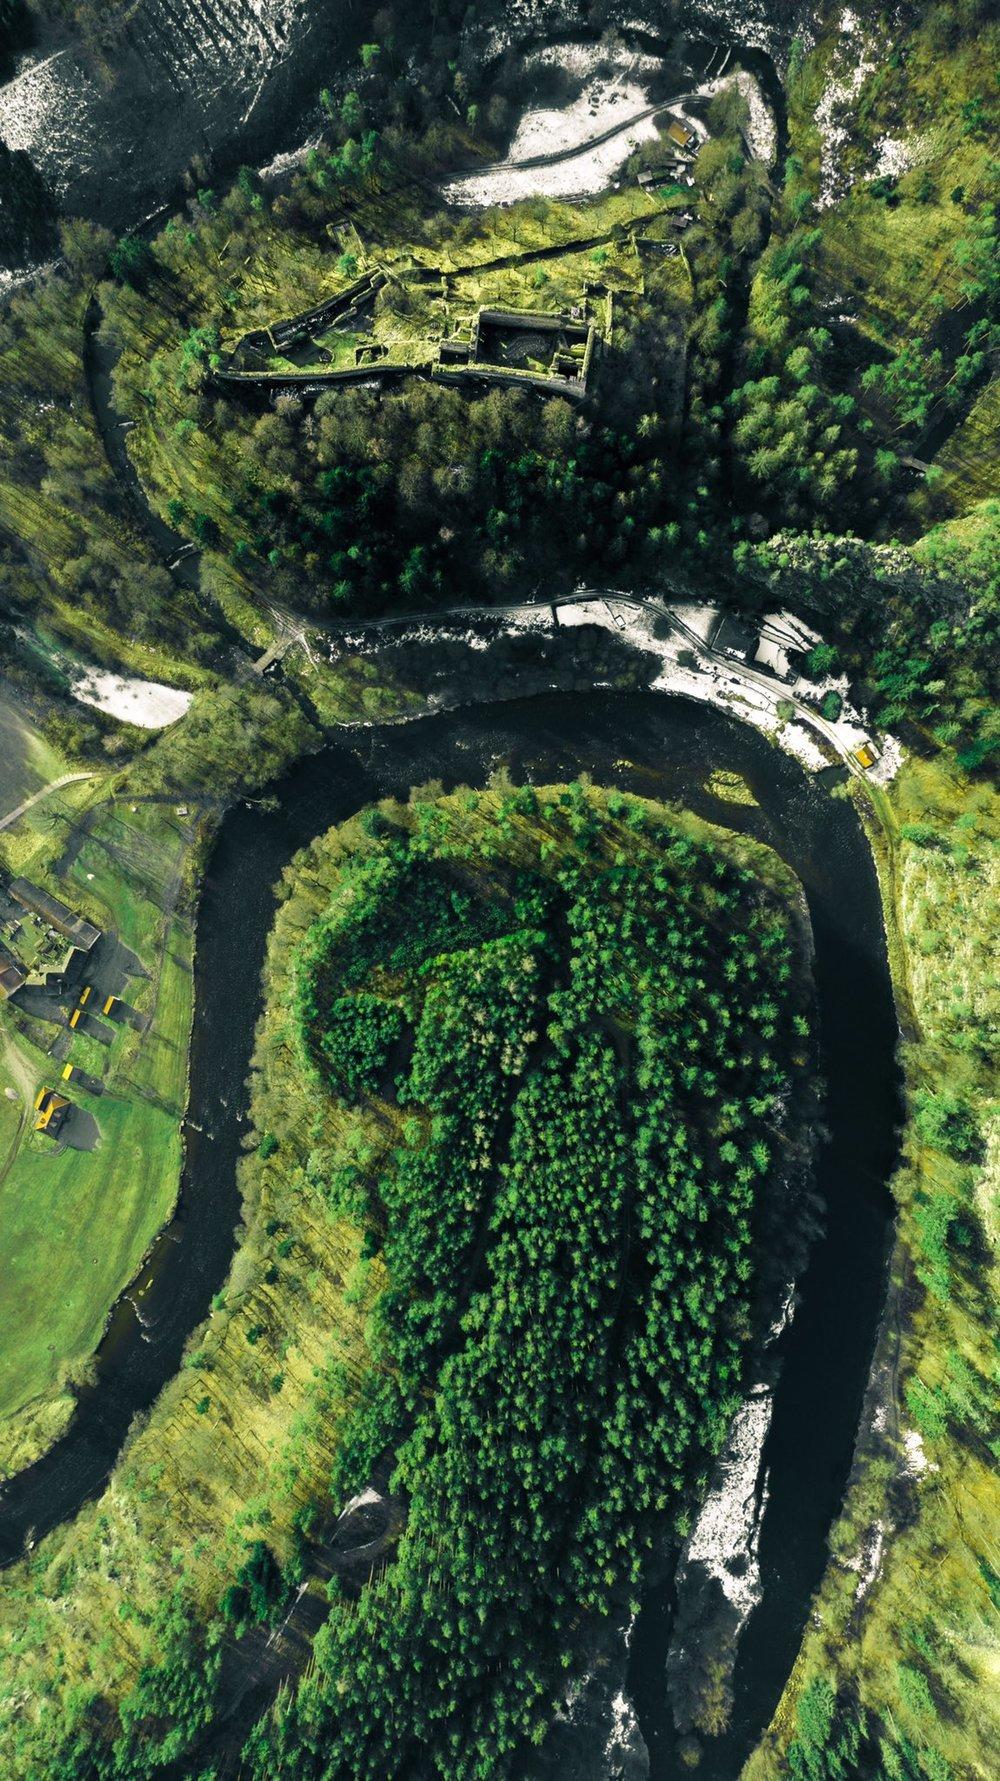 landscape_drone_photograhy_11.jpg